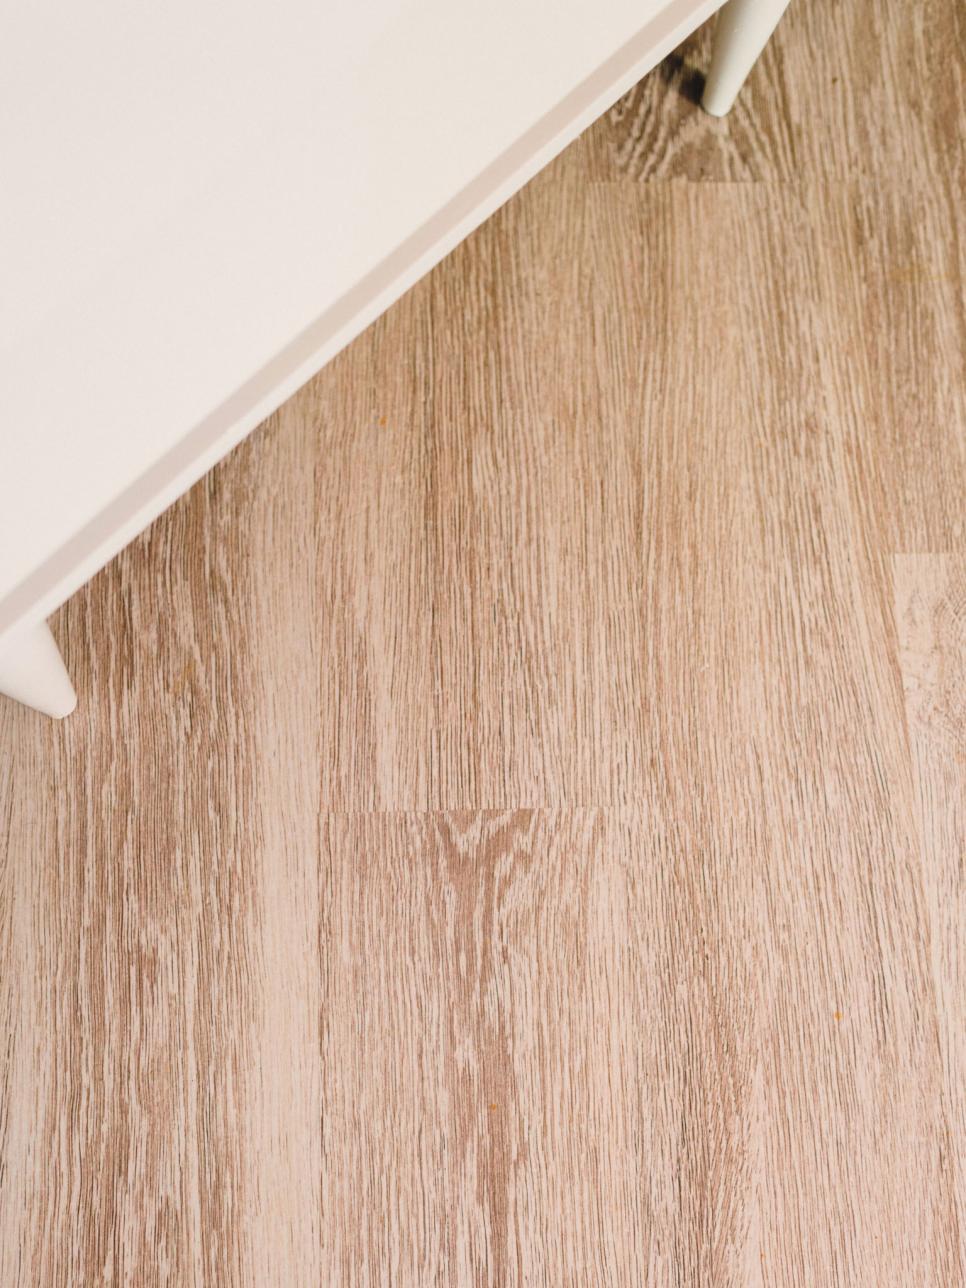 Basement flooring ideas basement flooring pictures hgtv for Cheap flooring alternatives to carpet